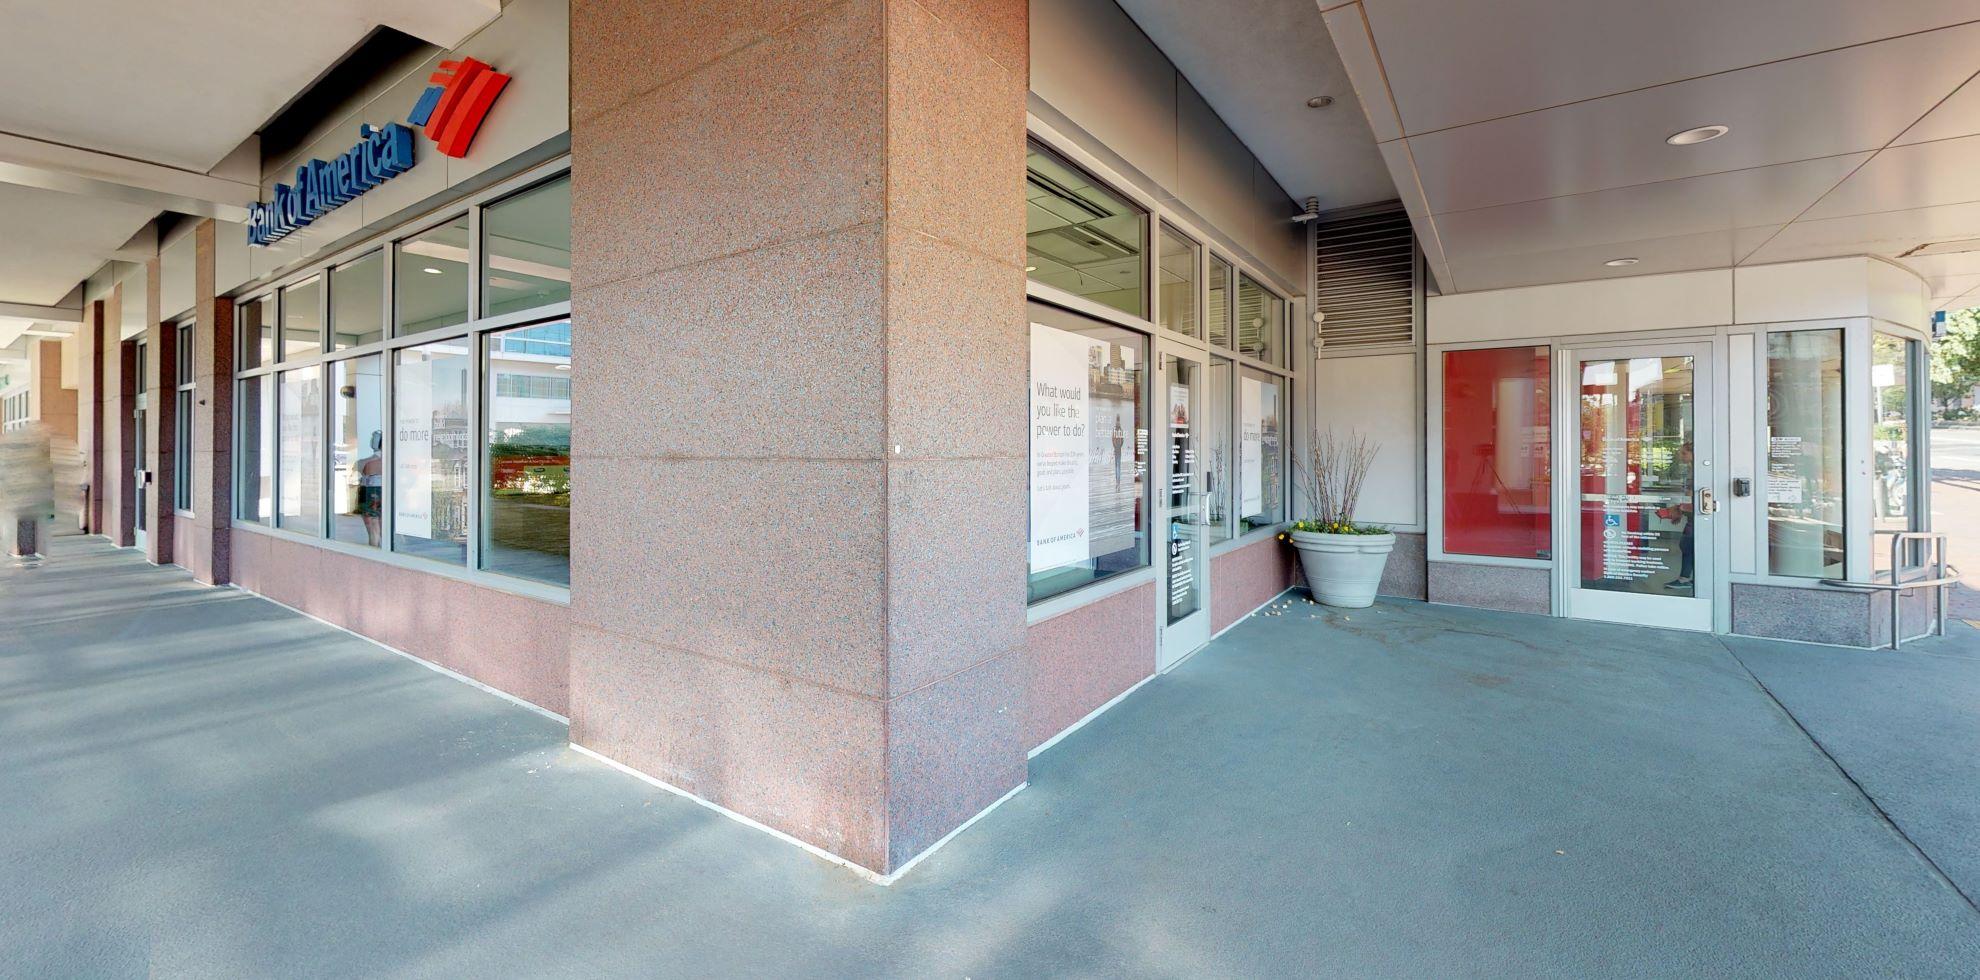 Bank of America ATM & Financial Center Near You | 161 Cambridge St., Boston, MA 02114